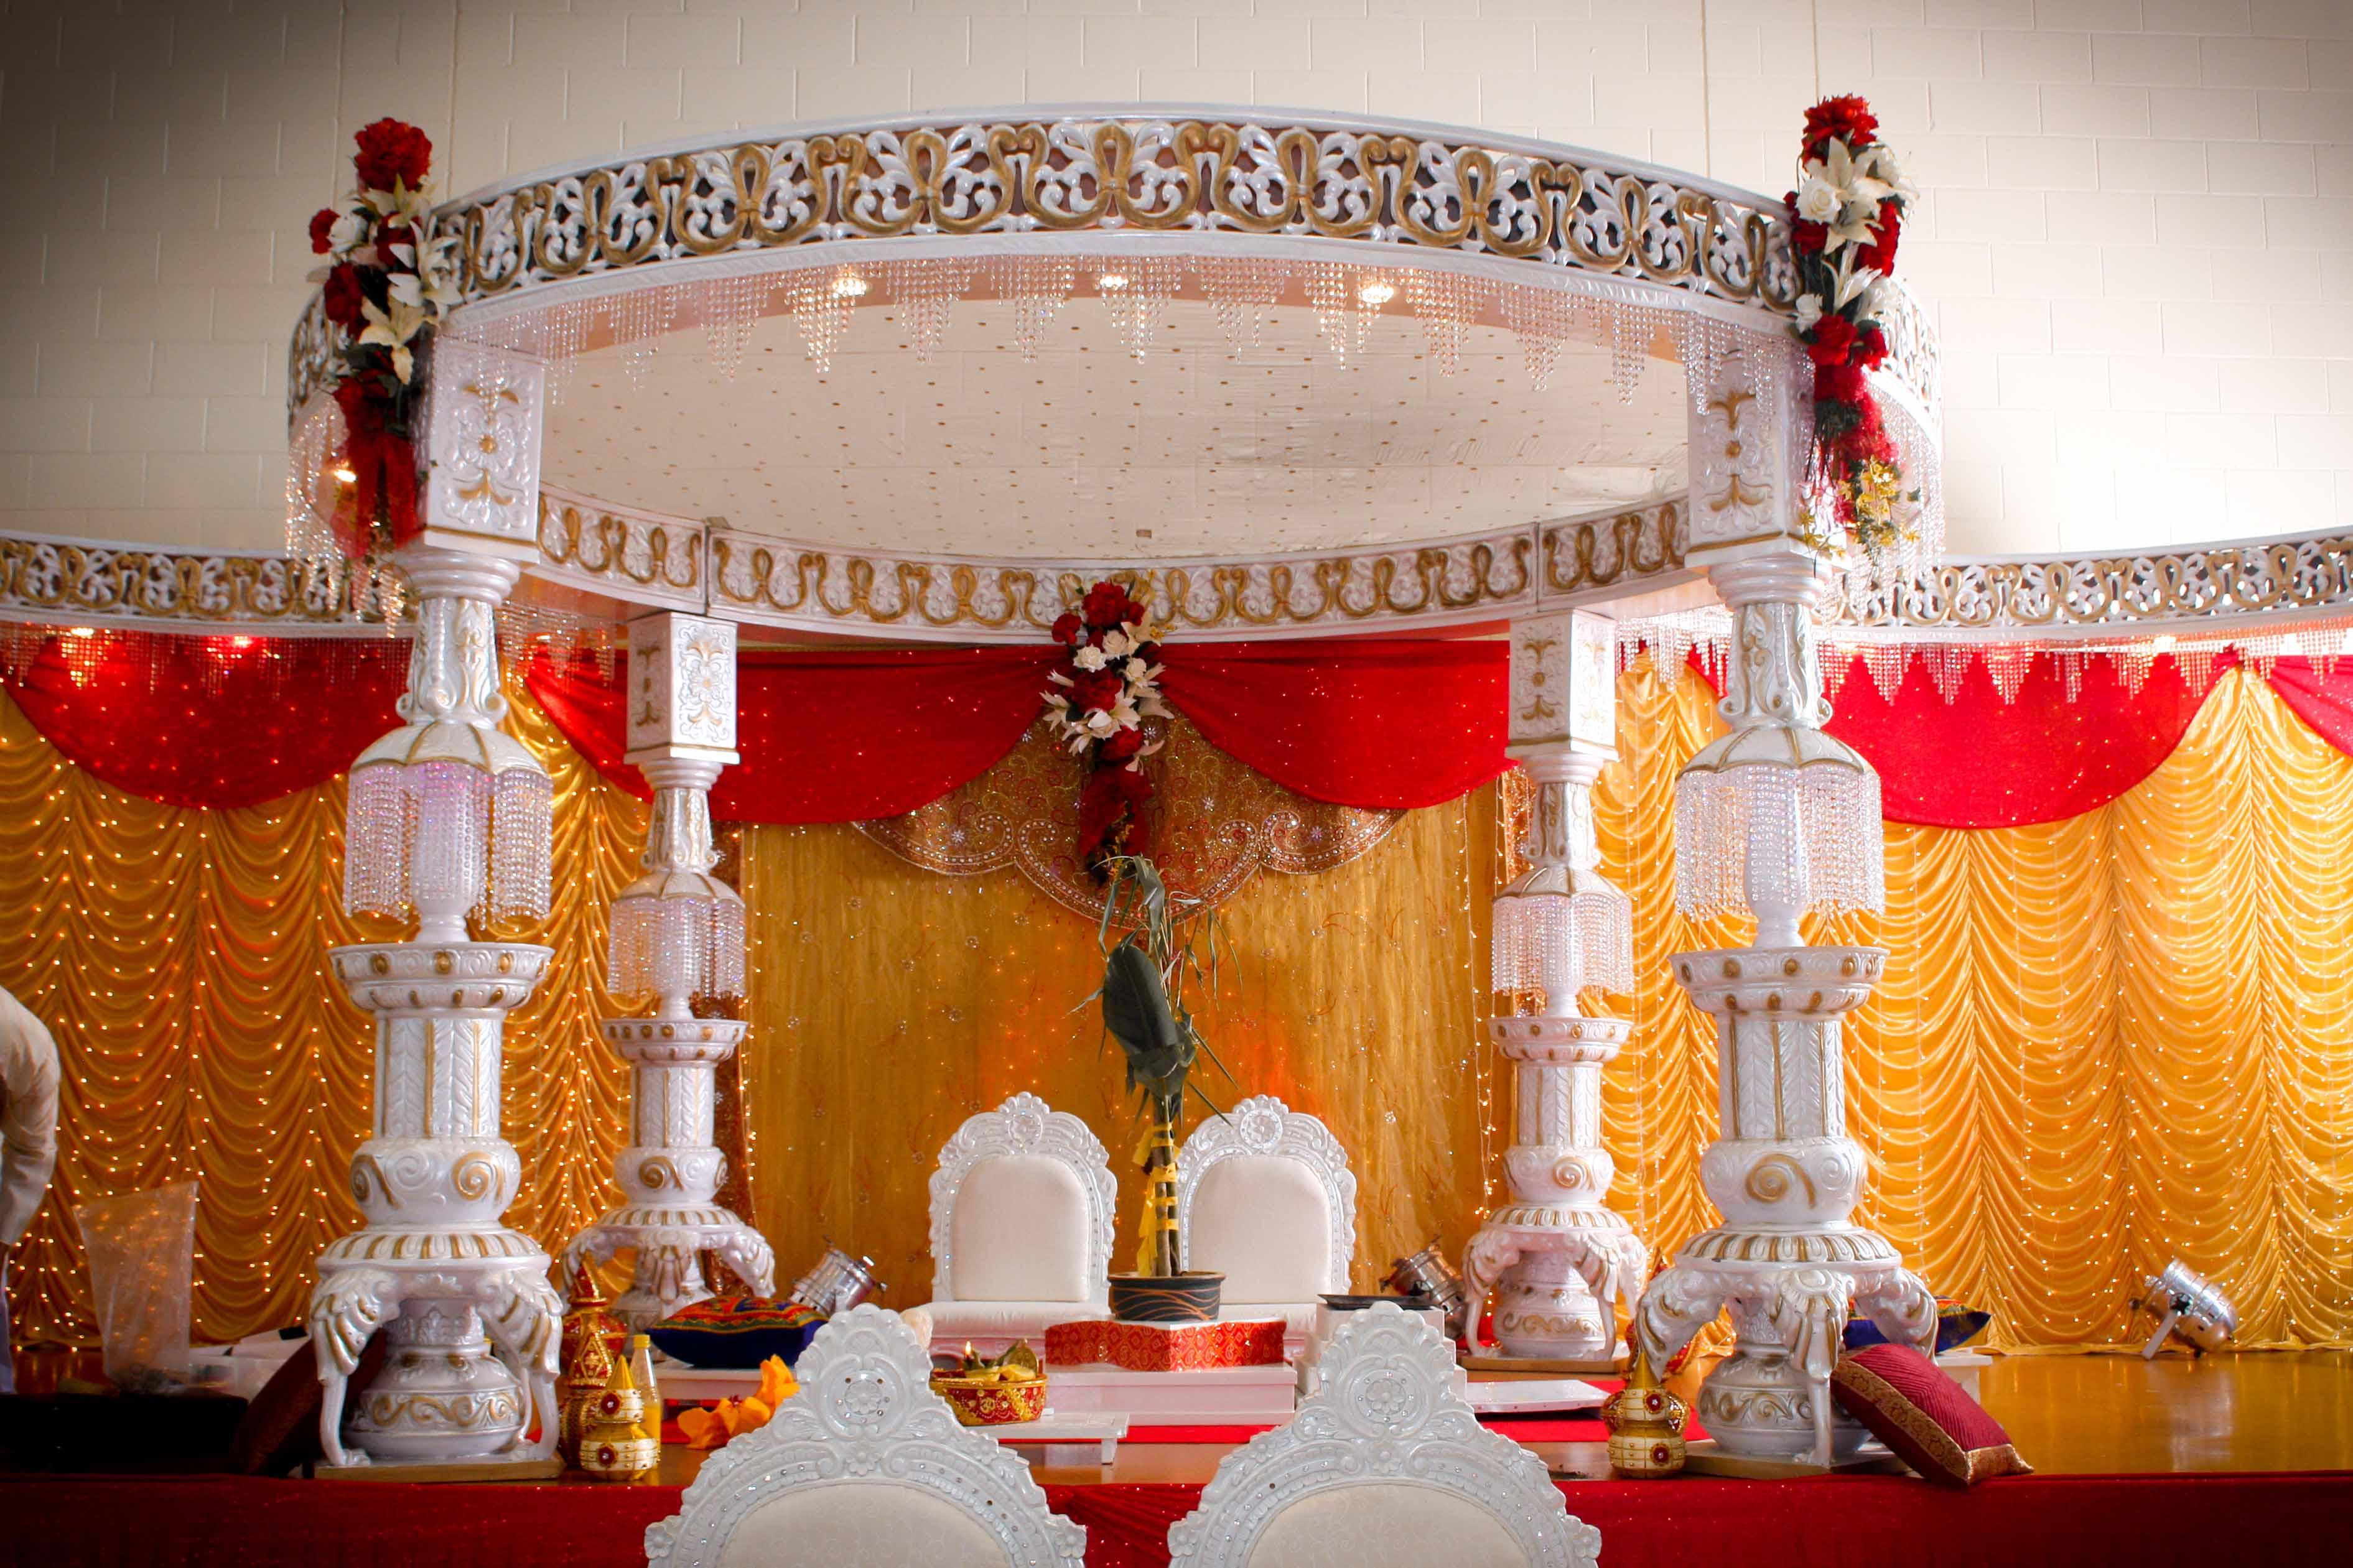 New indian wedding decorations auckland wedding wedding decorations nz ranis mandap auckland weddings junglespirit Gallery